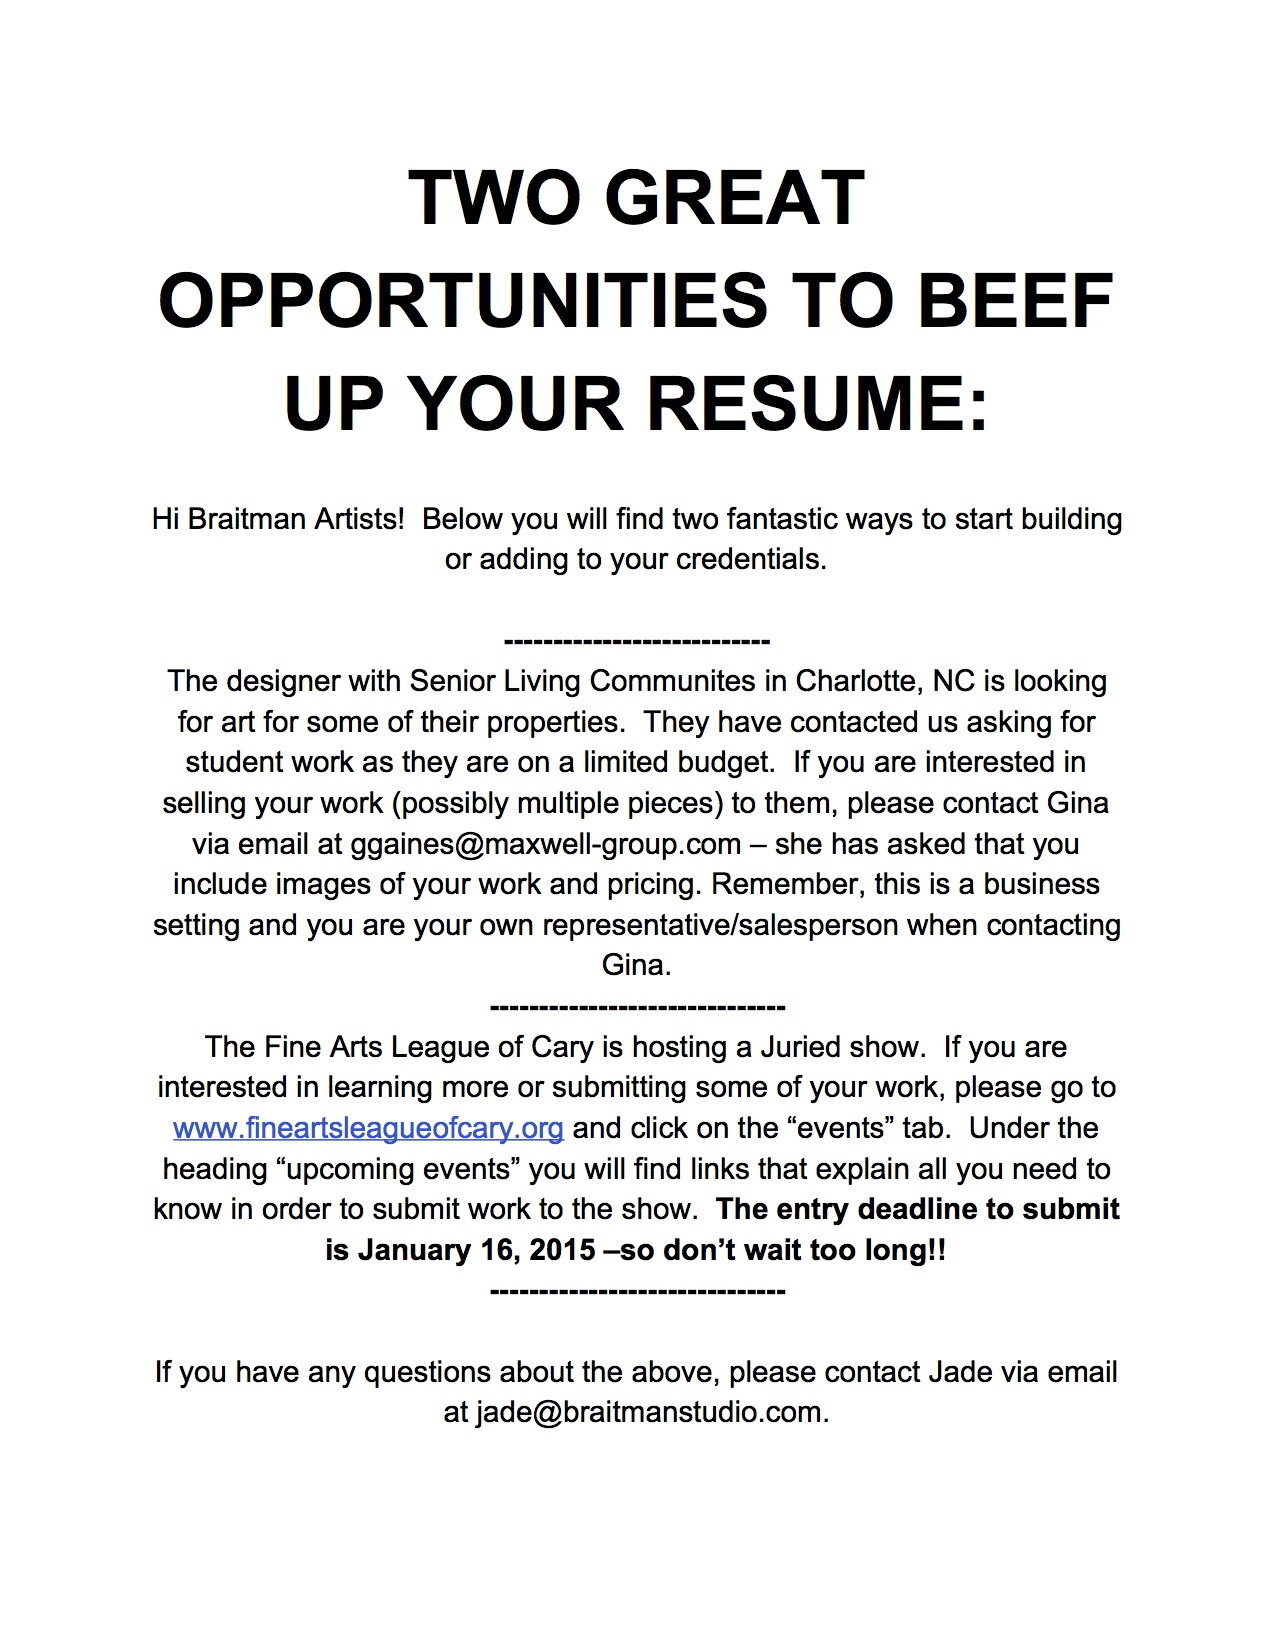 Two Great Opportunities To Beef Up Your Resume Braitman Studio